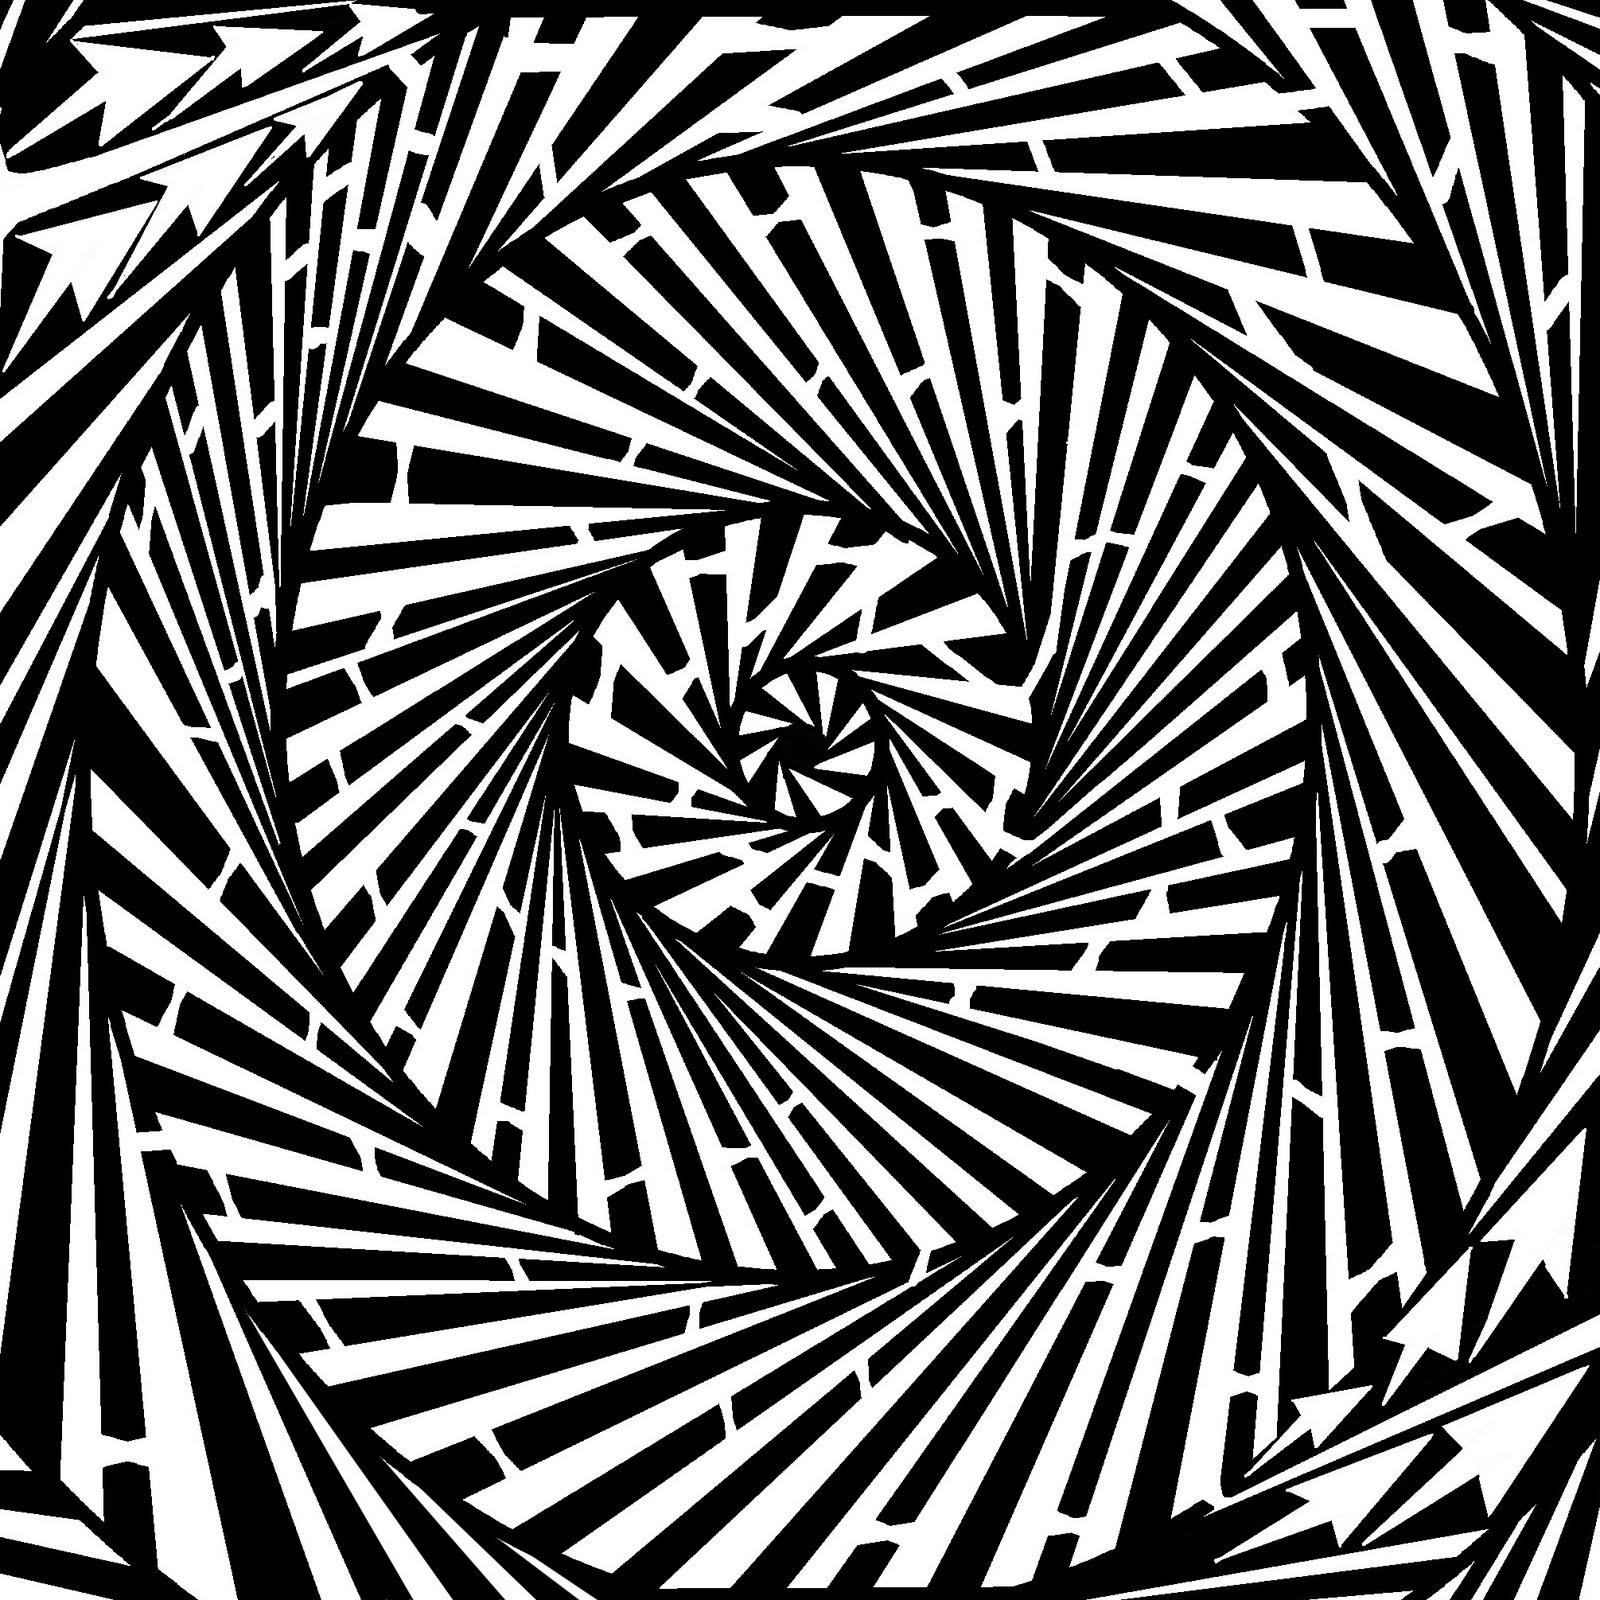 mazes maze binary cartoons super options trading swirly zen spinny amazing scary frimer yonatan